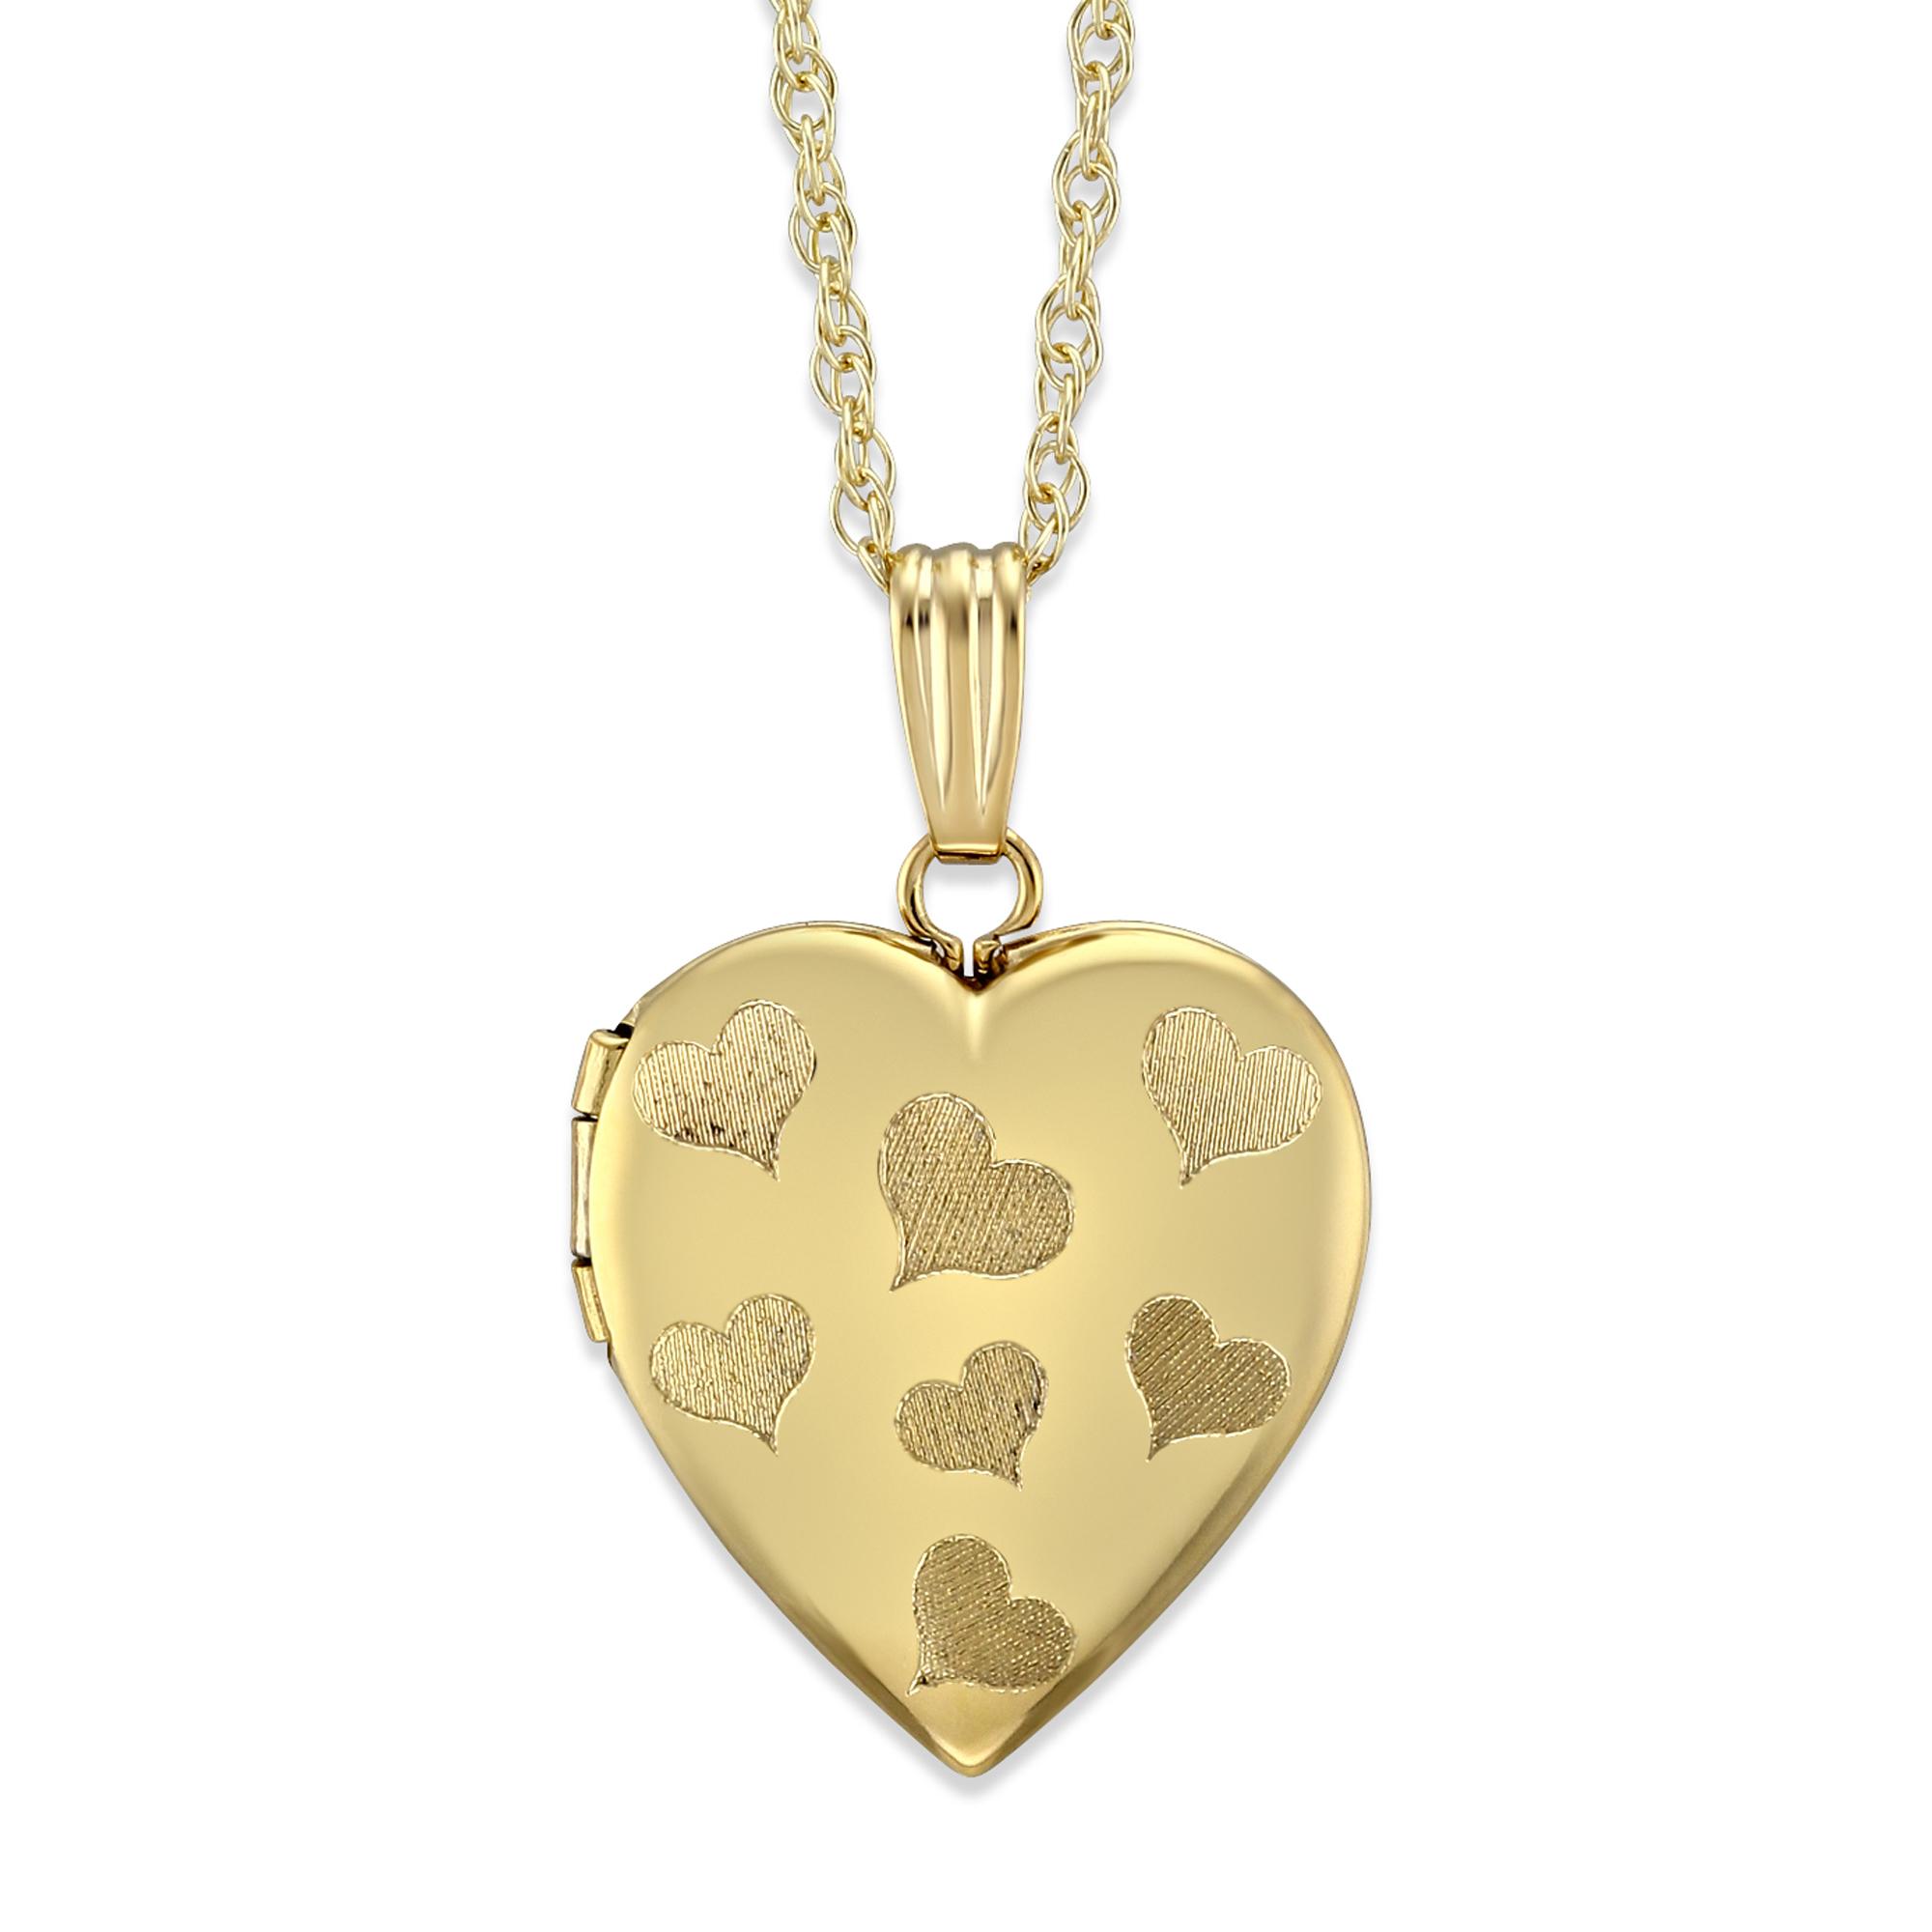 39f76c331d 14K Yellow Gold Heart Locket, 18